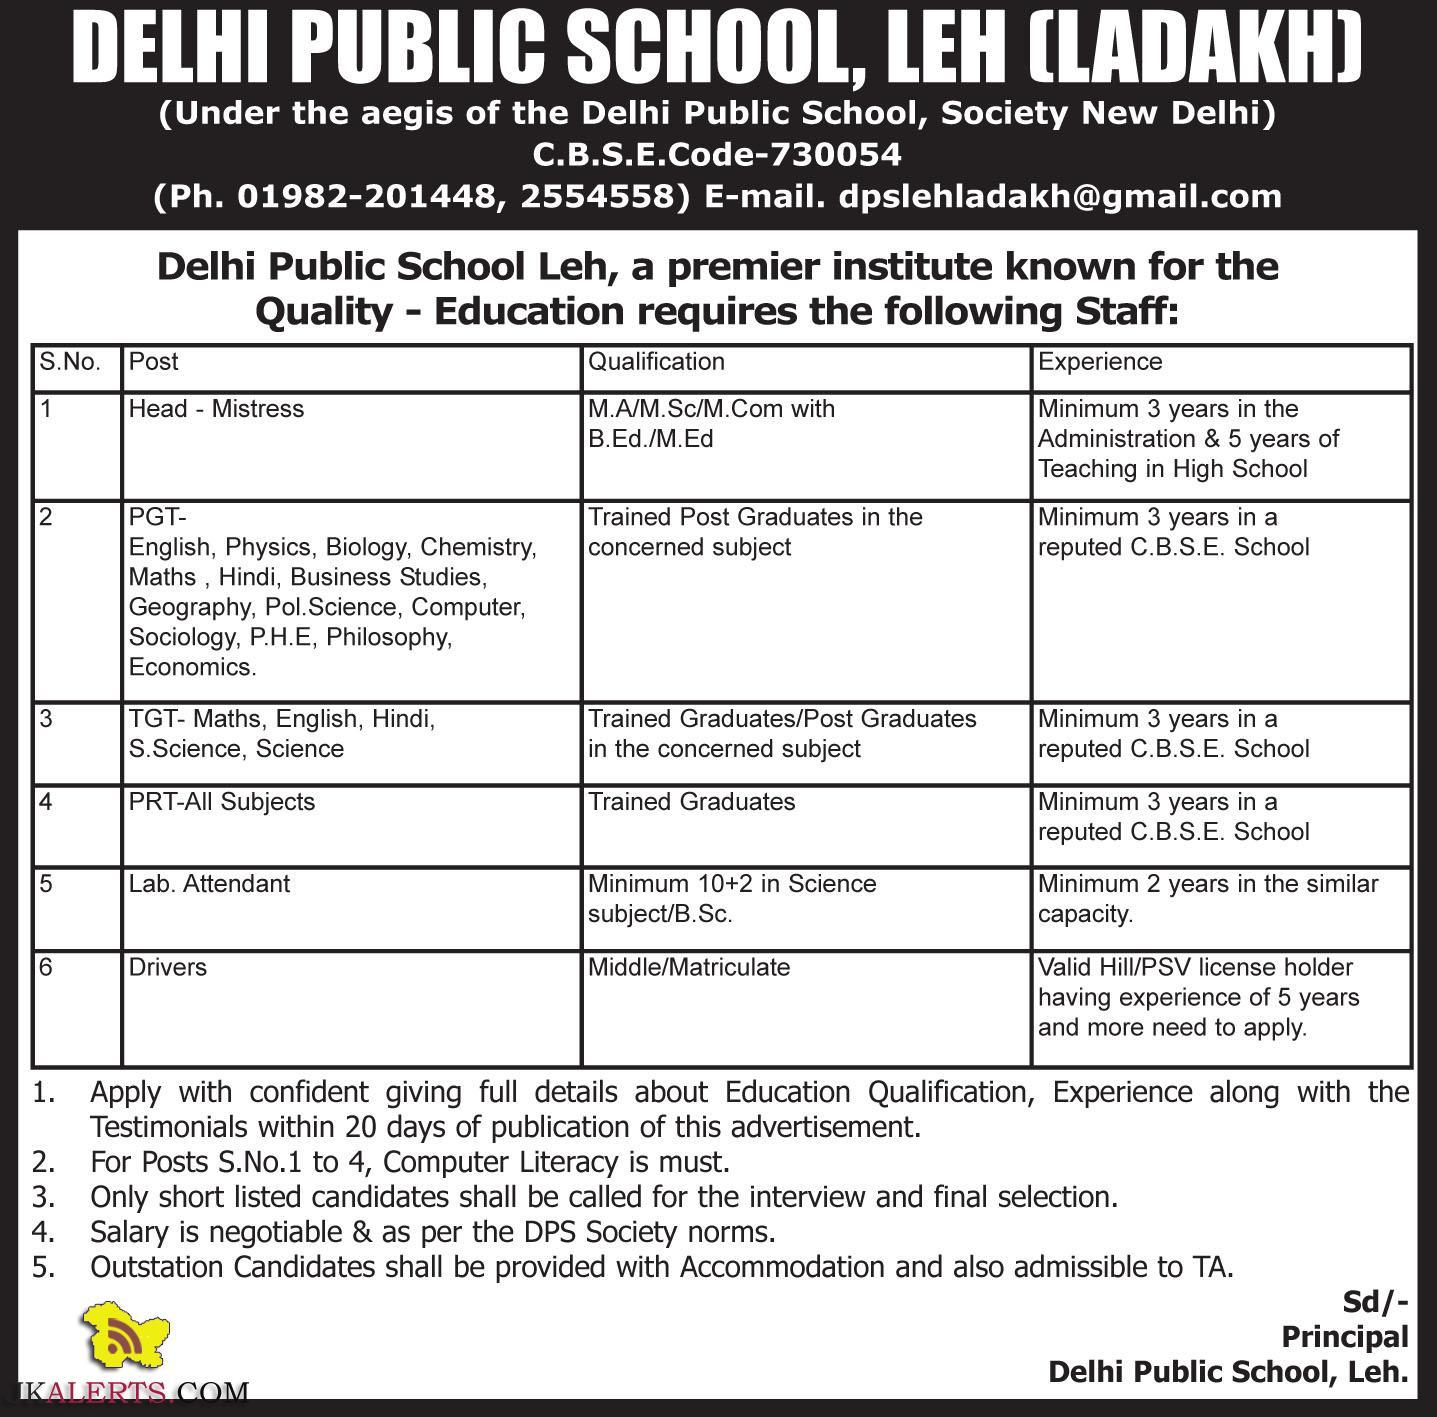 JOBS IN DELHI PUBLIC SCHOOL, LEH (LADAKH)